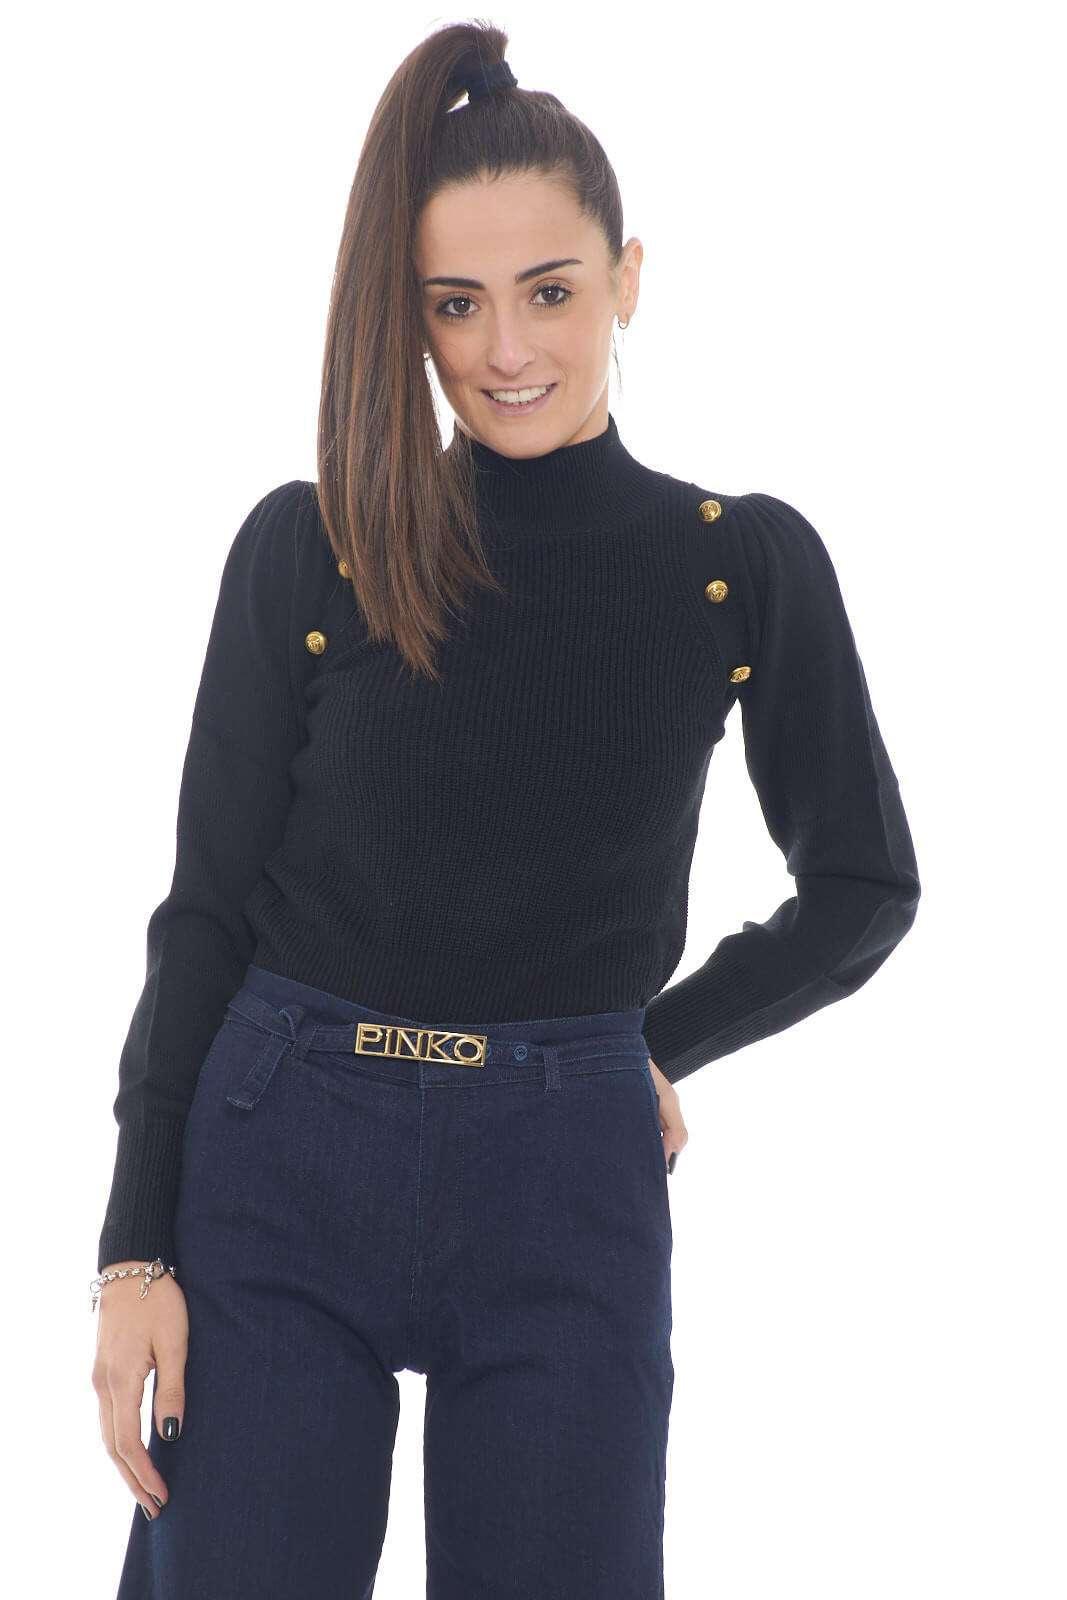 AI outlet parmax maglia donna Pinko 1G15L6 A